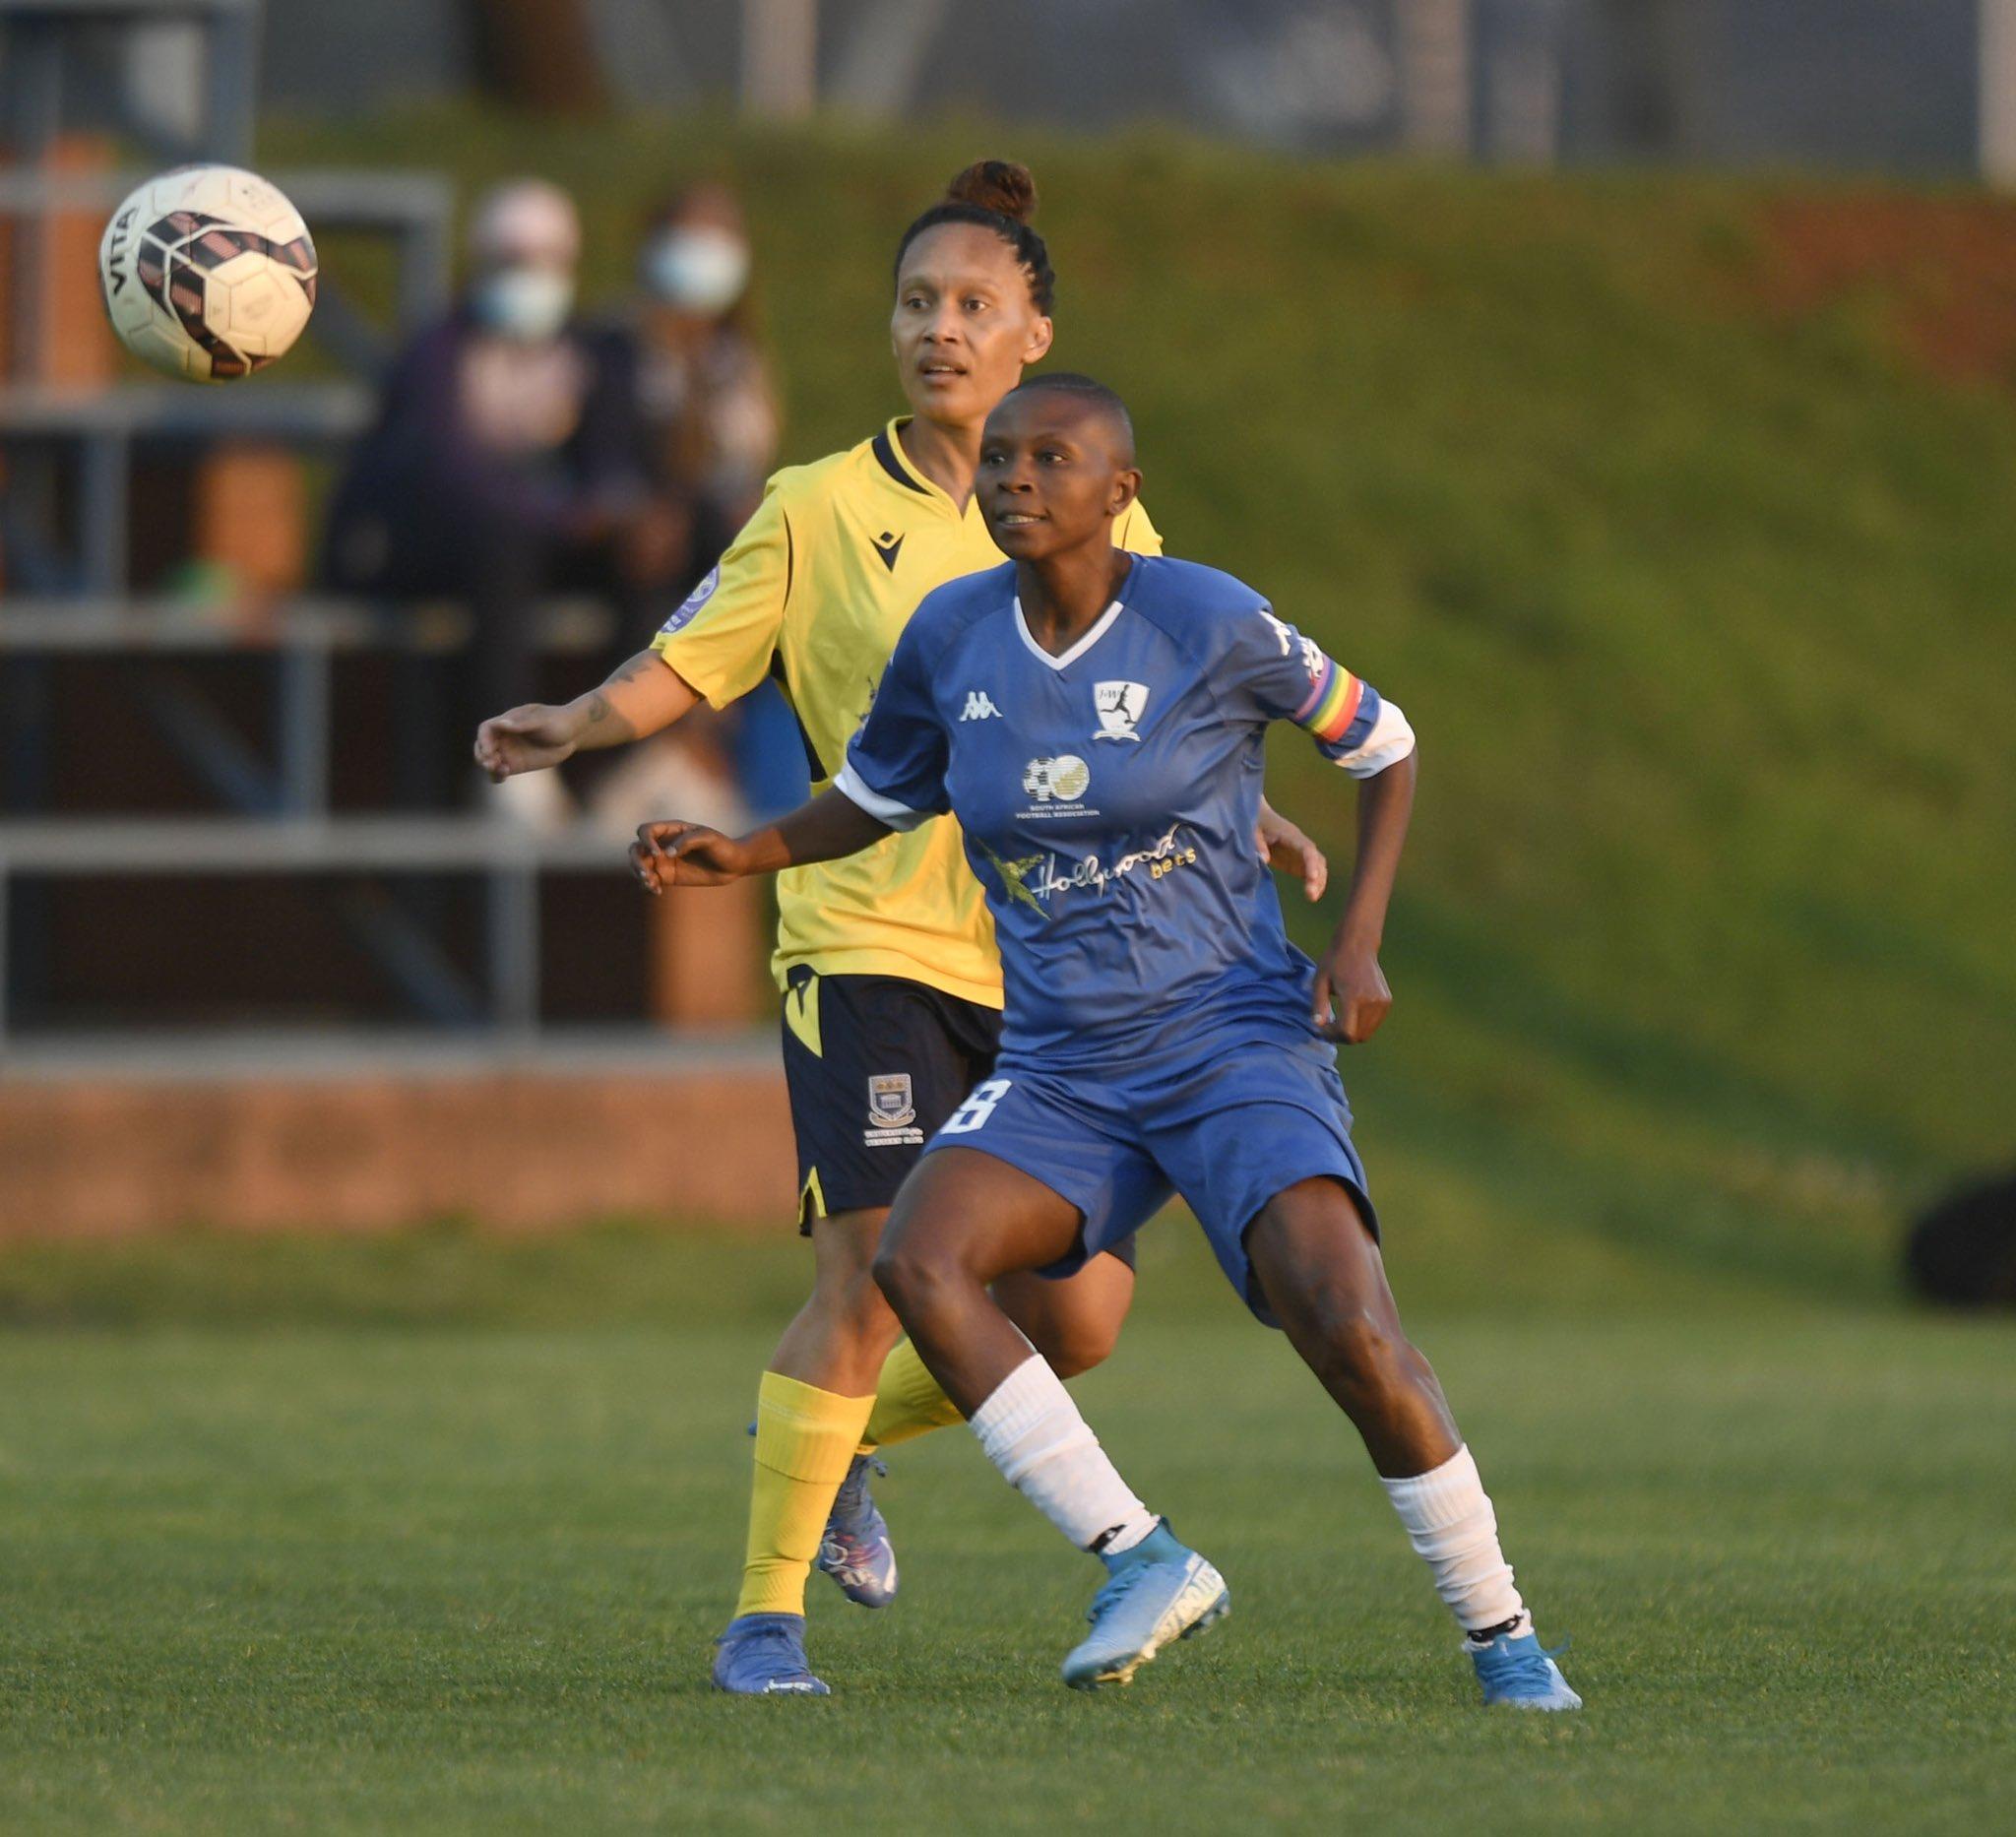 Nompumelelo Nyandeni and Leandra Smeda